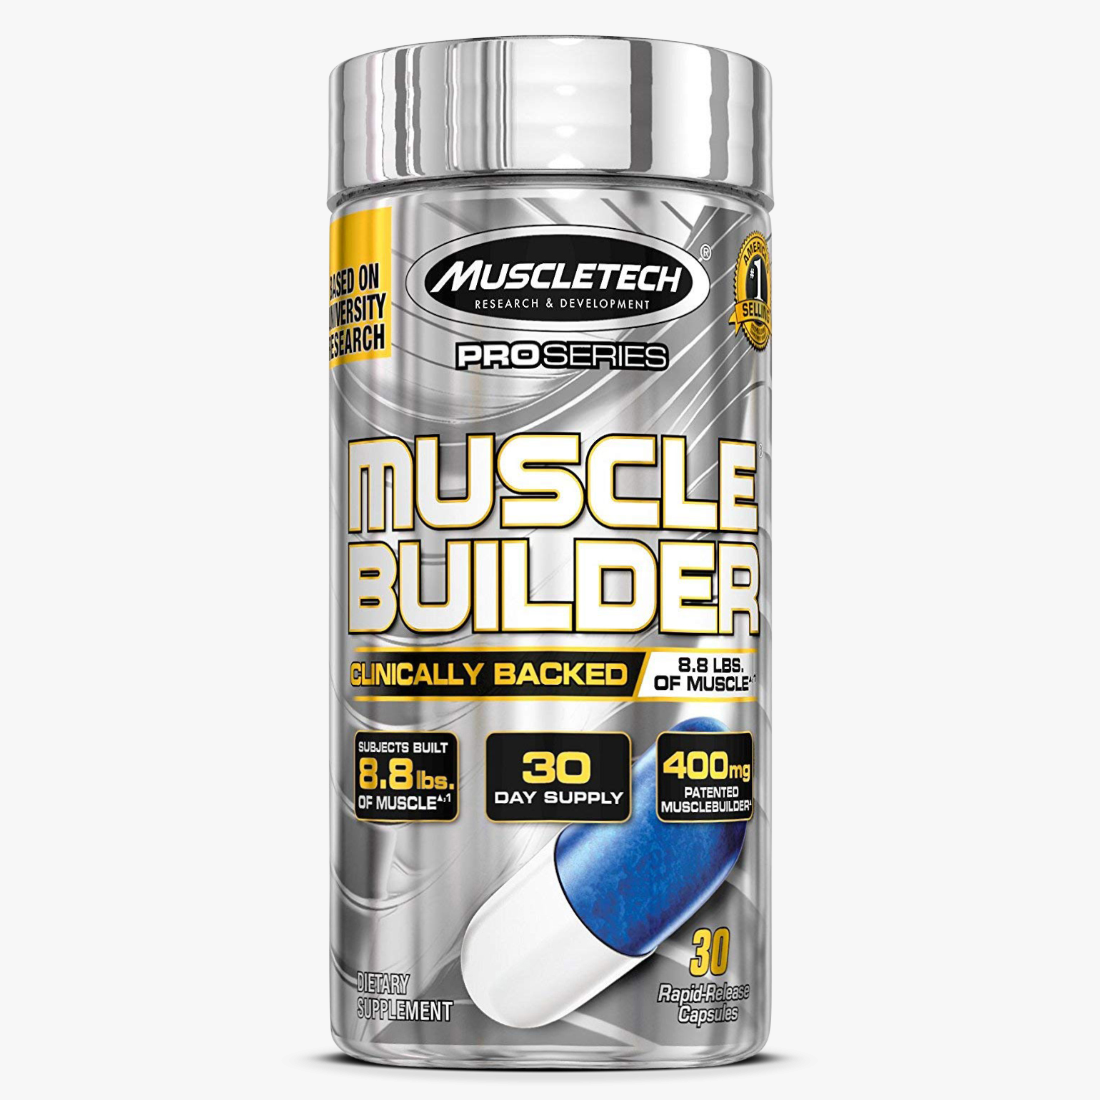 Muscletech - Muscle Builder